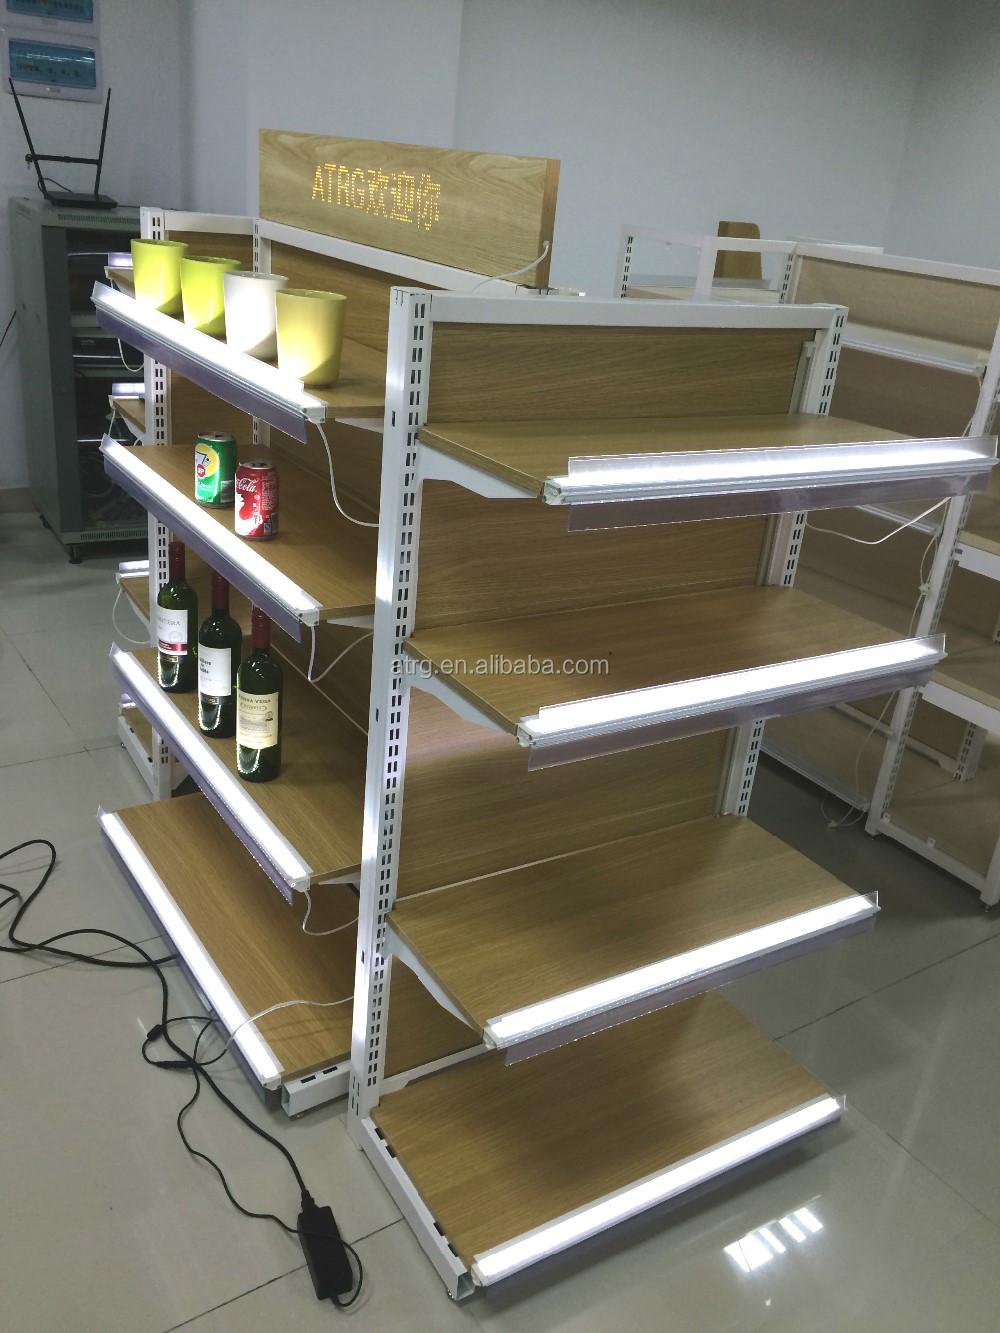 etagere gondola en bois double face a eclairage led offre speciale buy up lighting gondola shelving led wood gondola shelves product on alibaba com